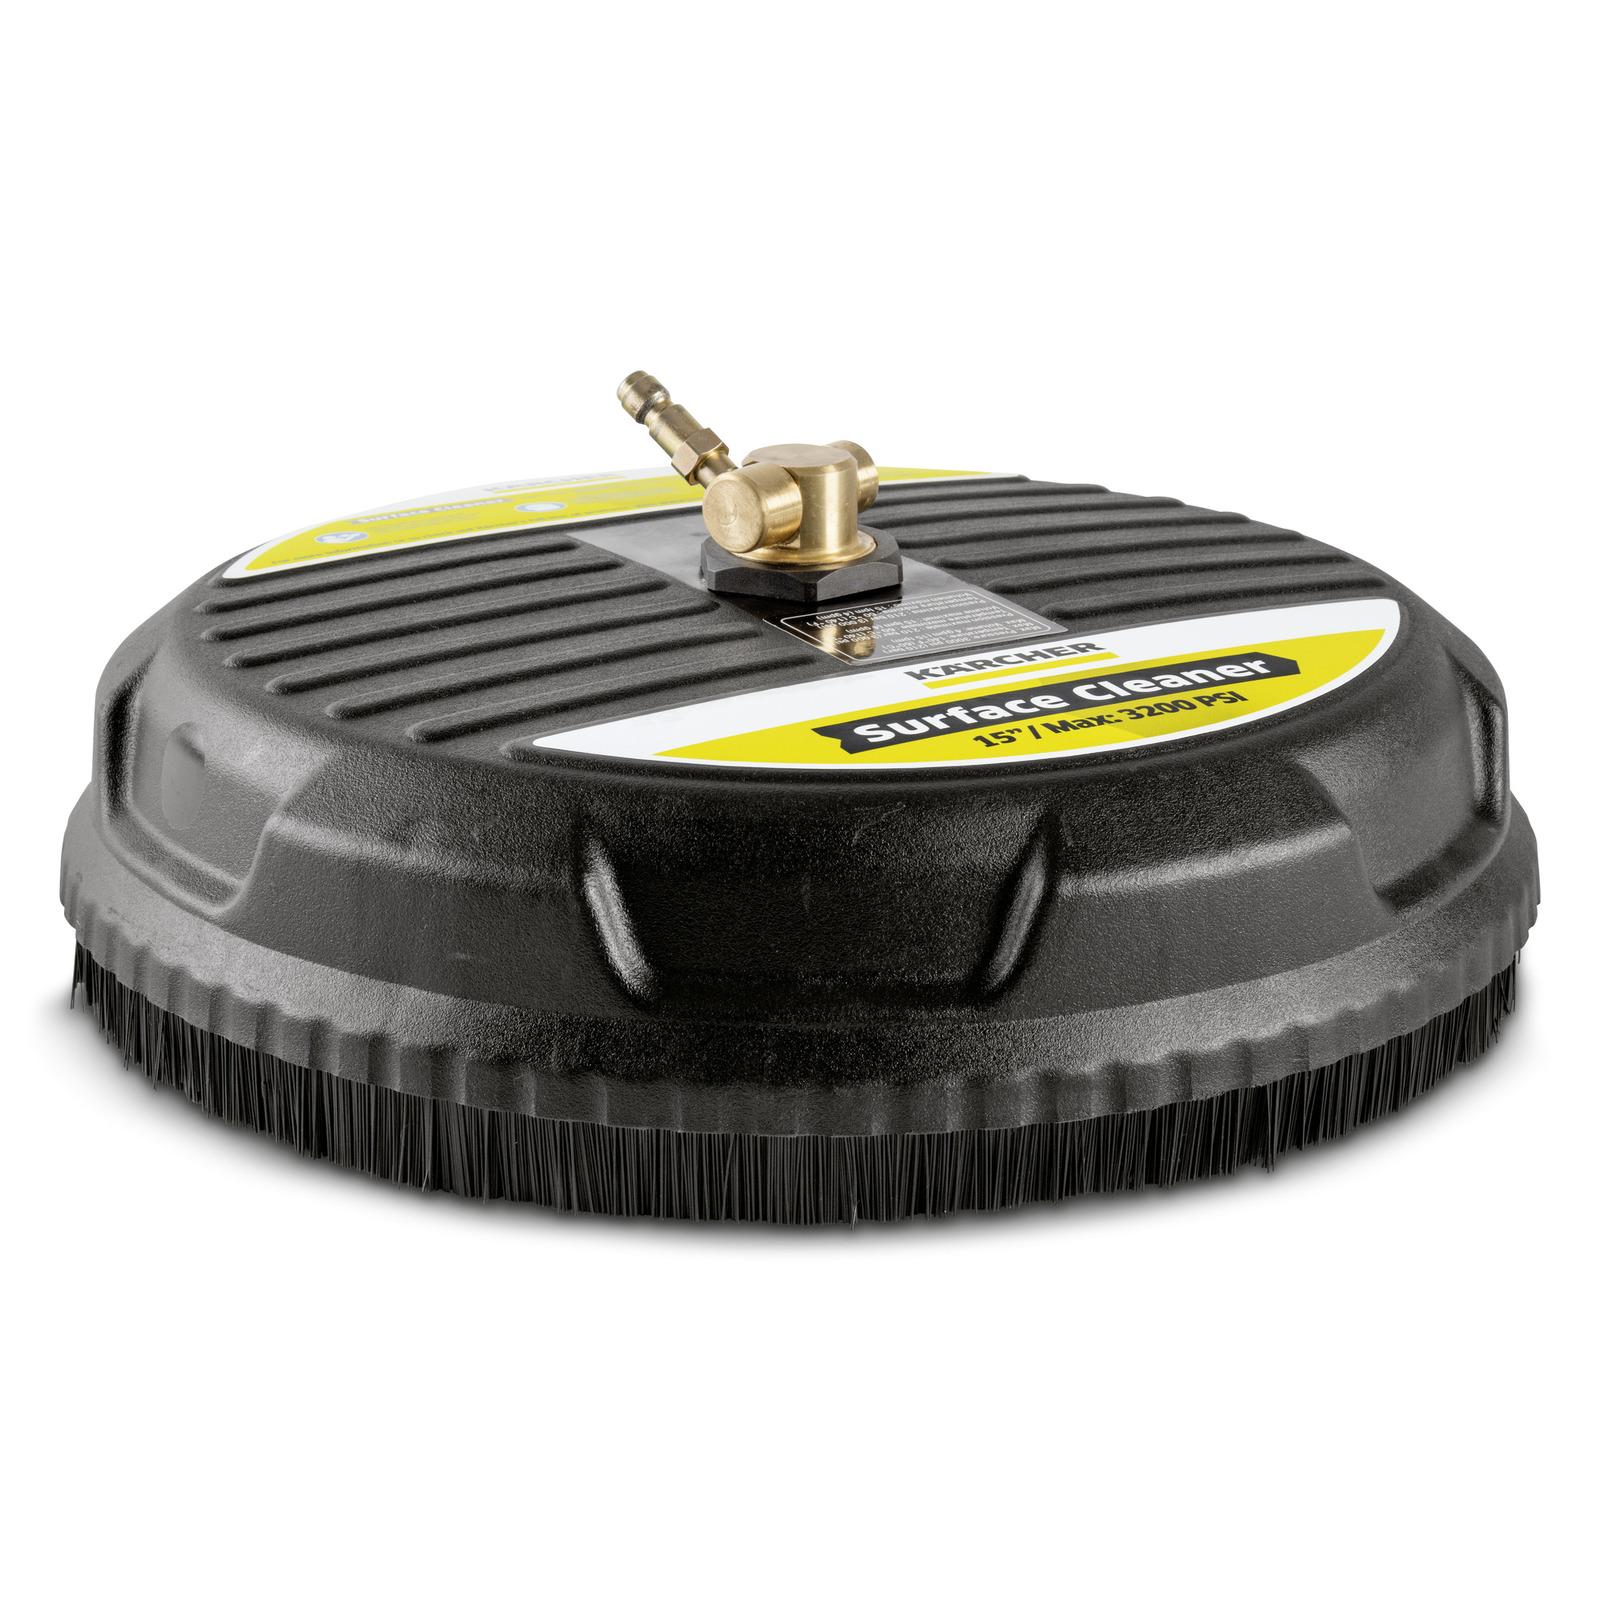 15 Surface Cleaner For Home Garden Pressure Washers Kärcher